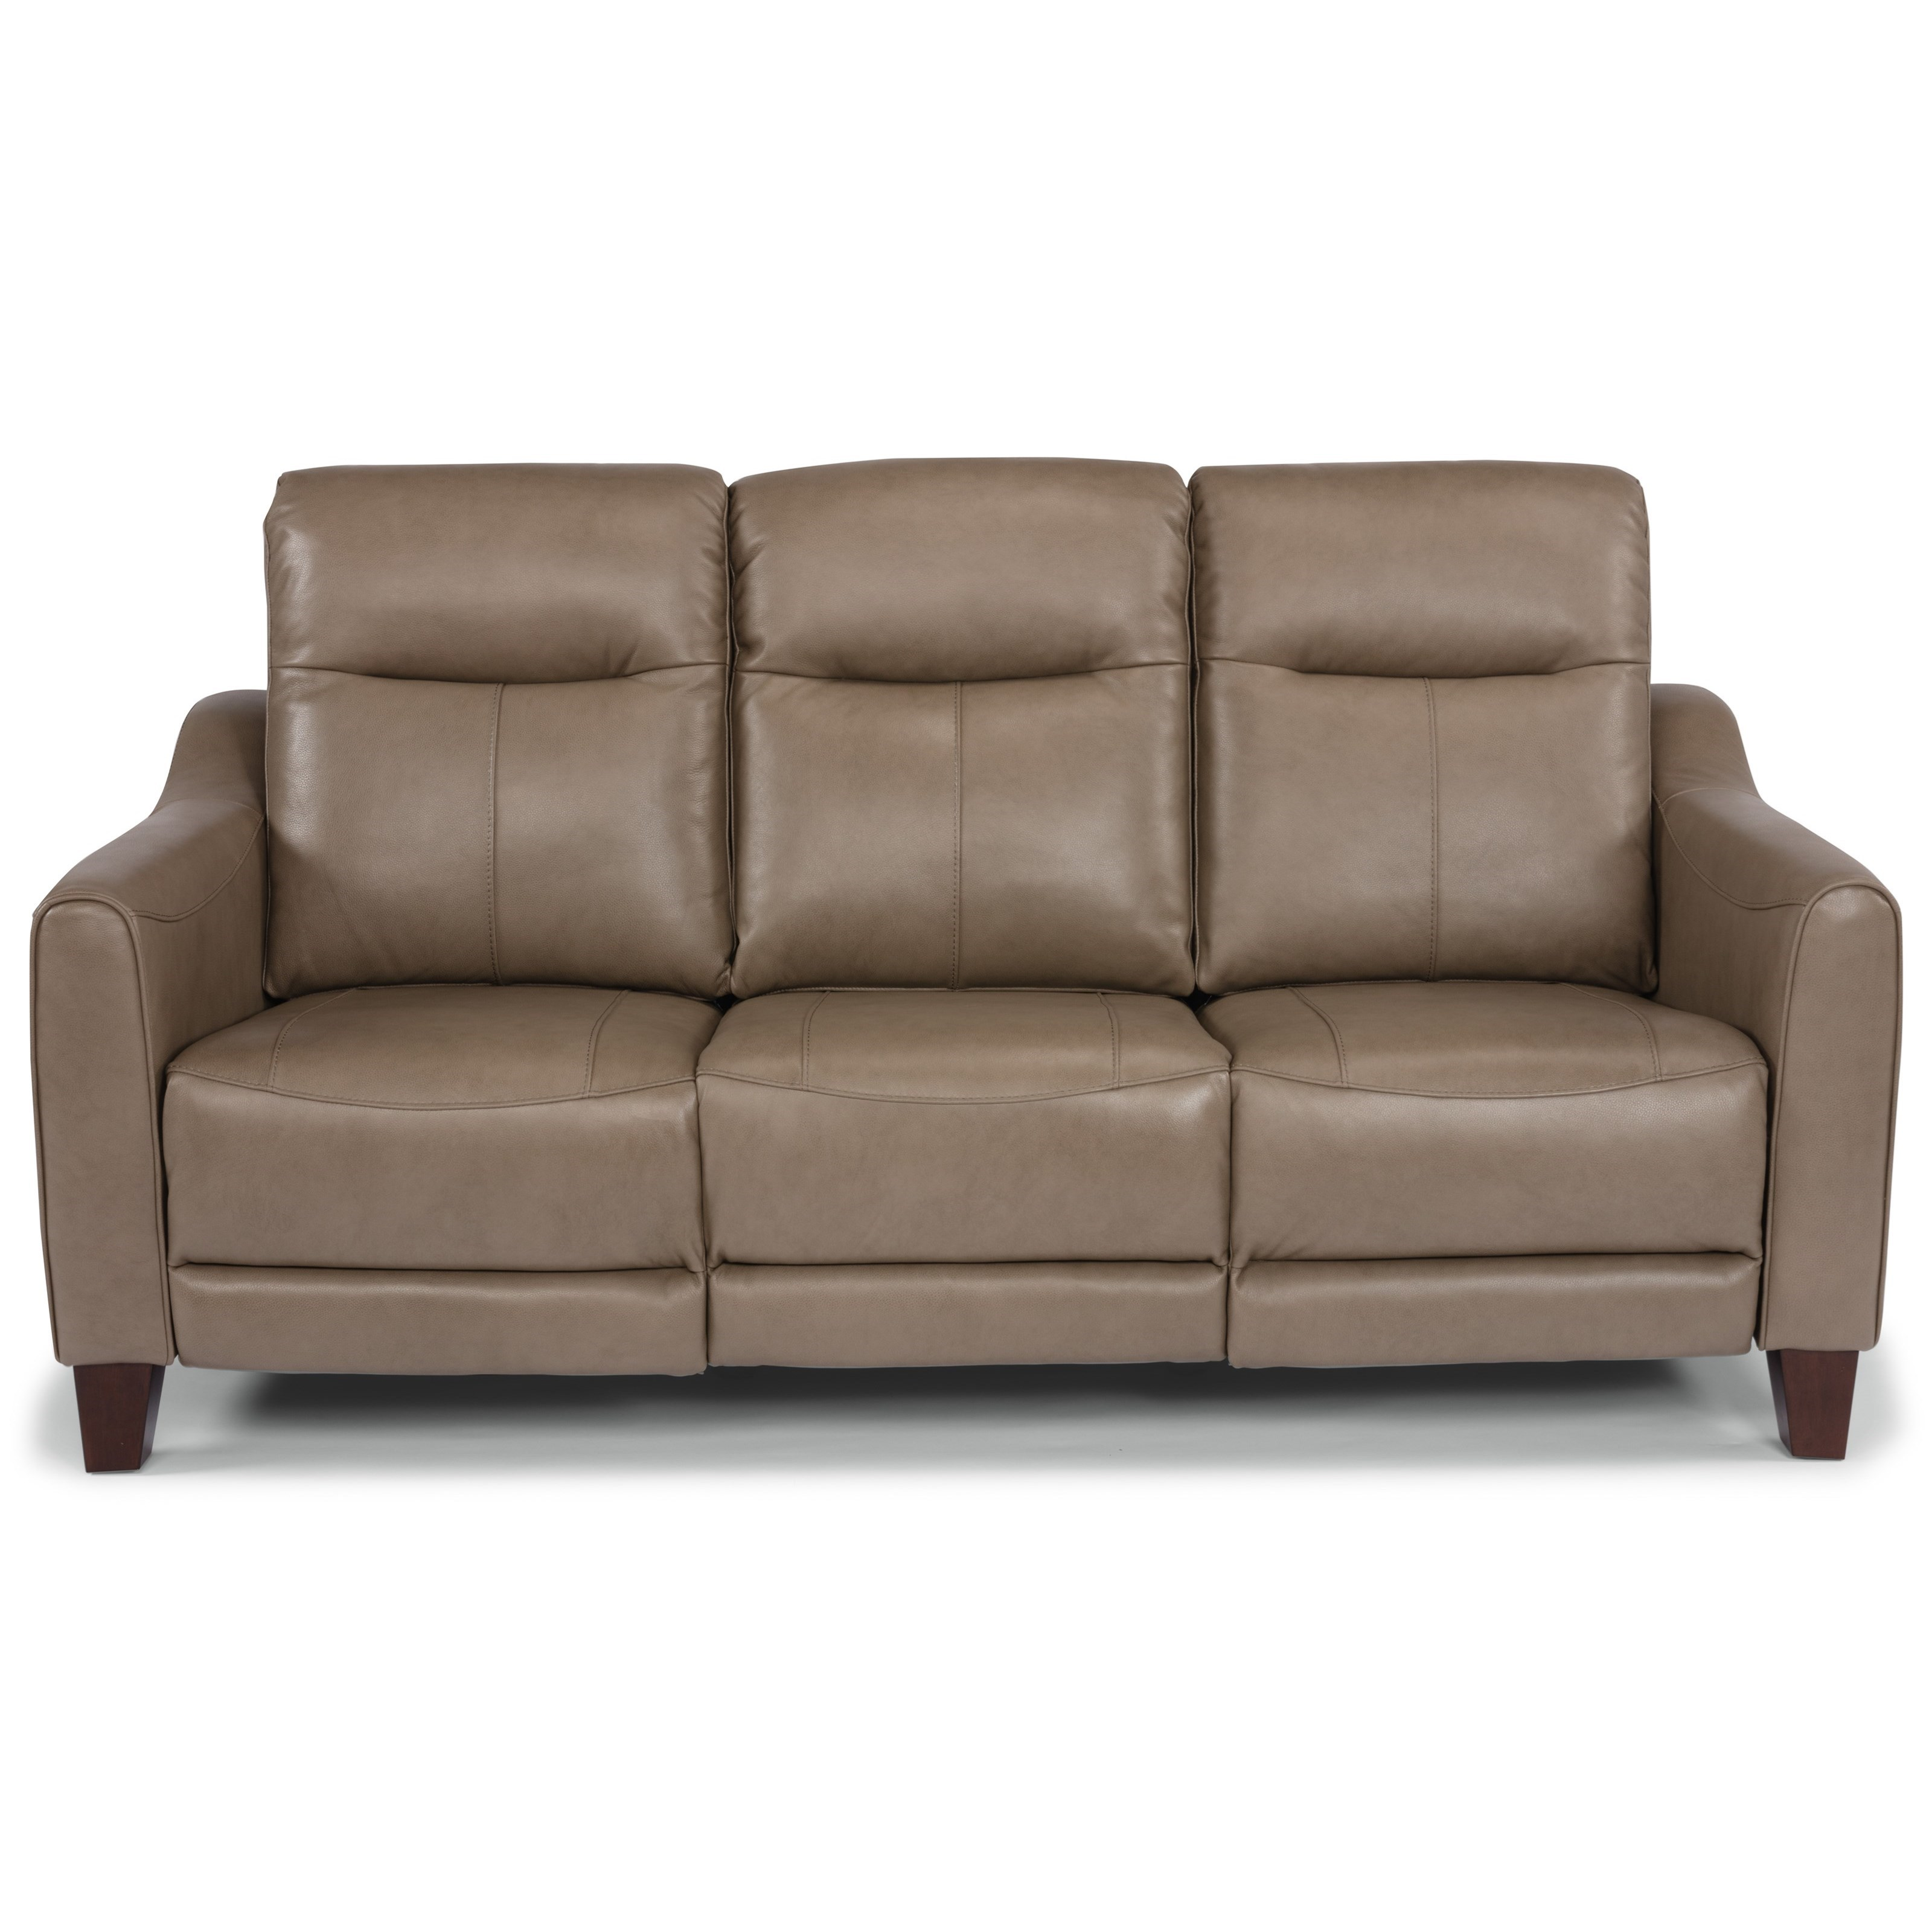 Latitudes - Forte Power Reclining Sofa by Flexsteel at Williams & Kay